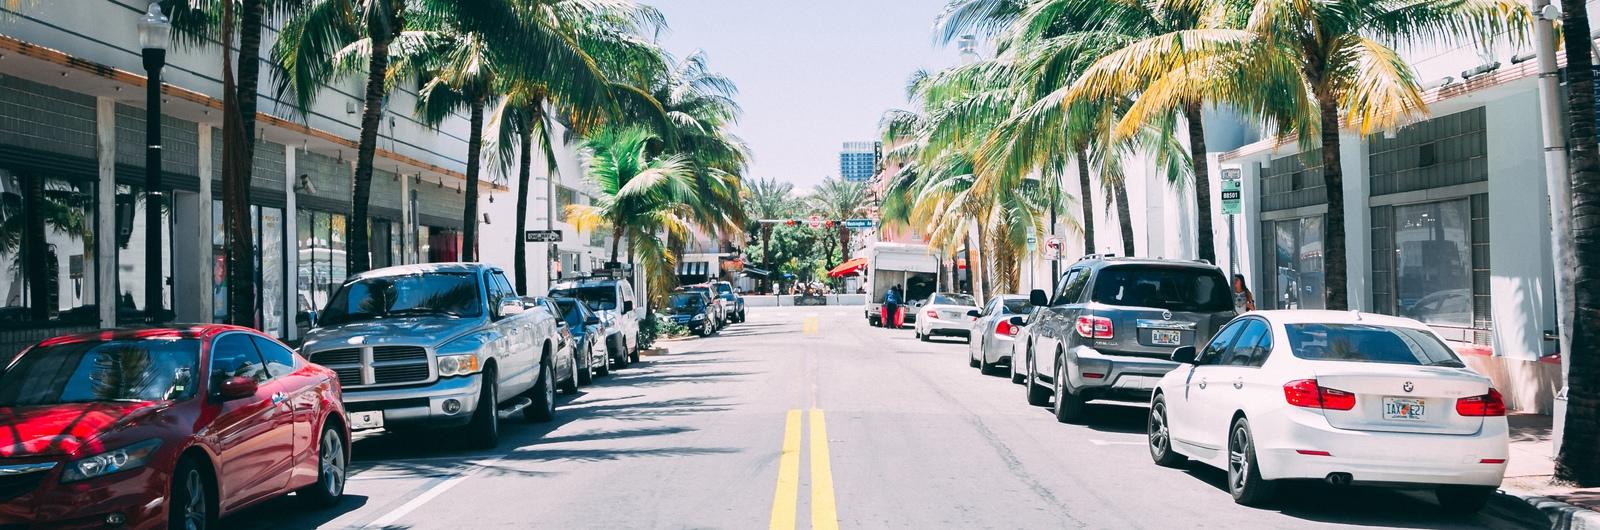 miami city header